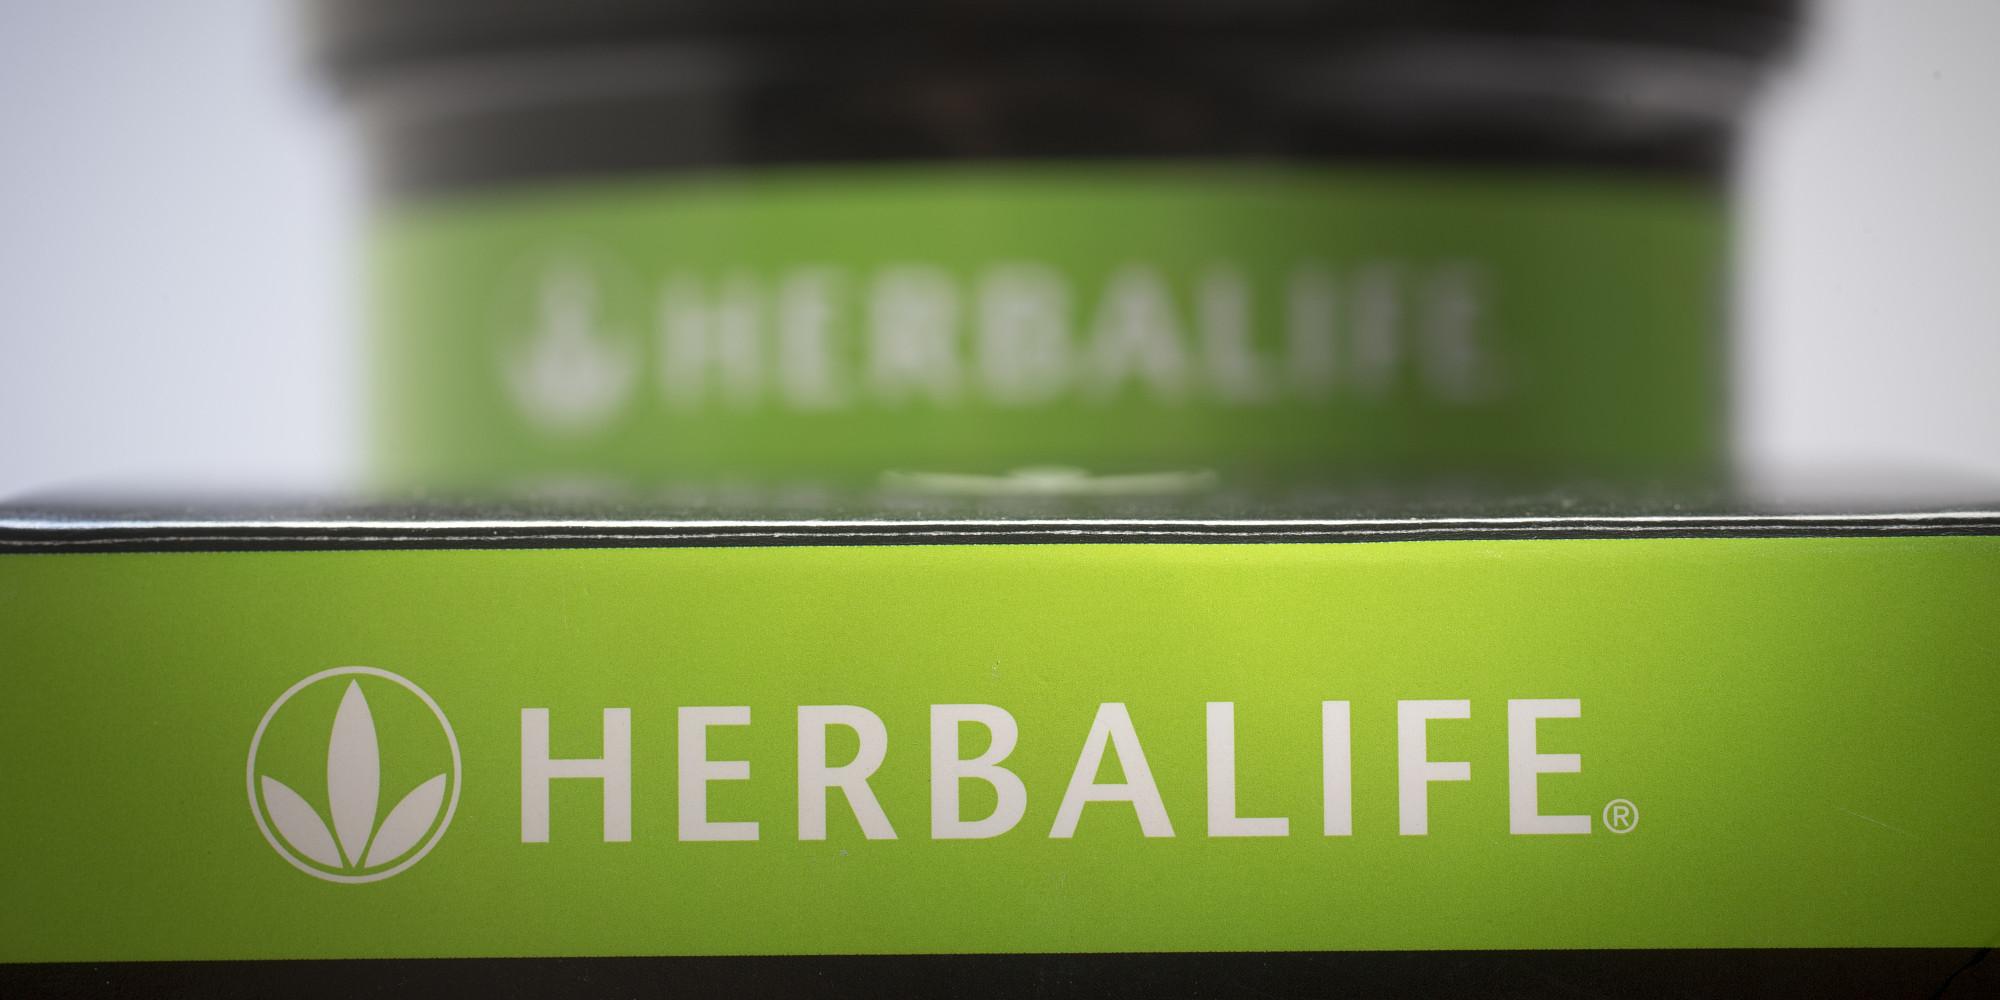 Herbalife Criticized As  U0026 39 Pyramid Scheme U0026 39  By Latino Activists